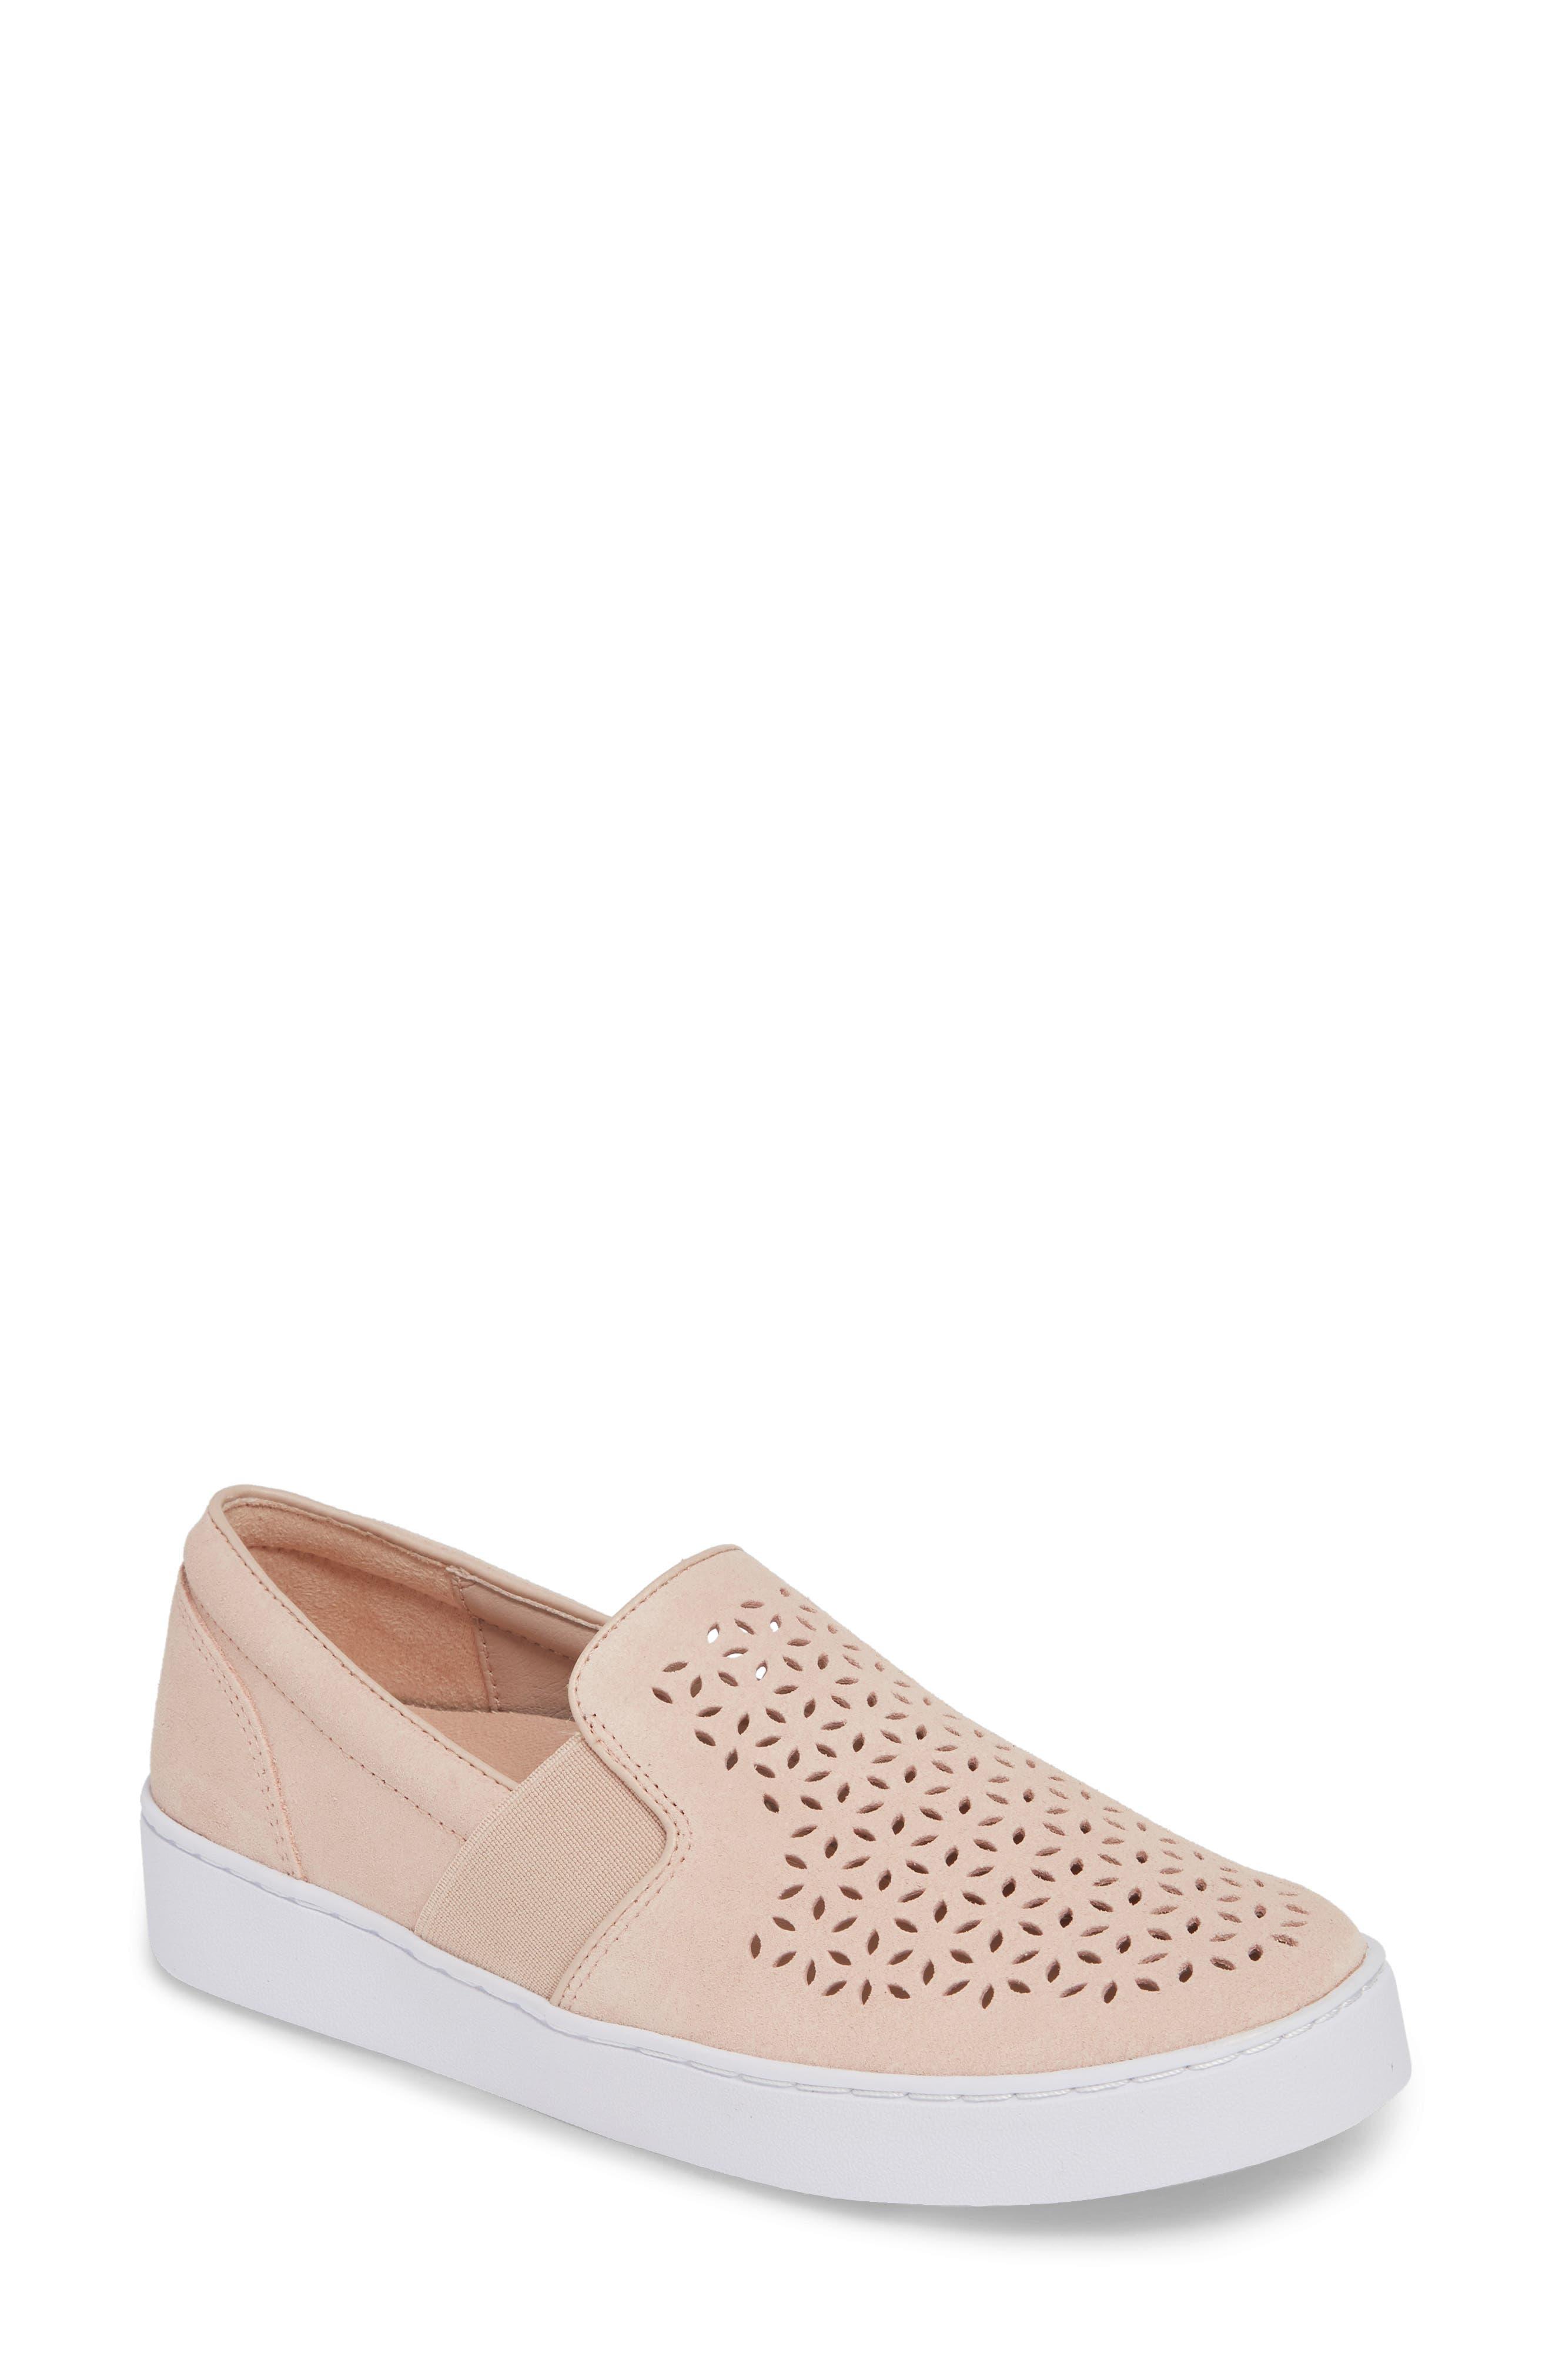 Vionic Kani Perforated Slip-On Sneaker, Pink